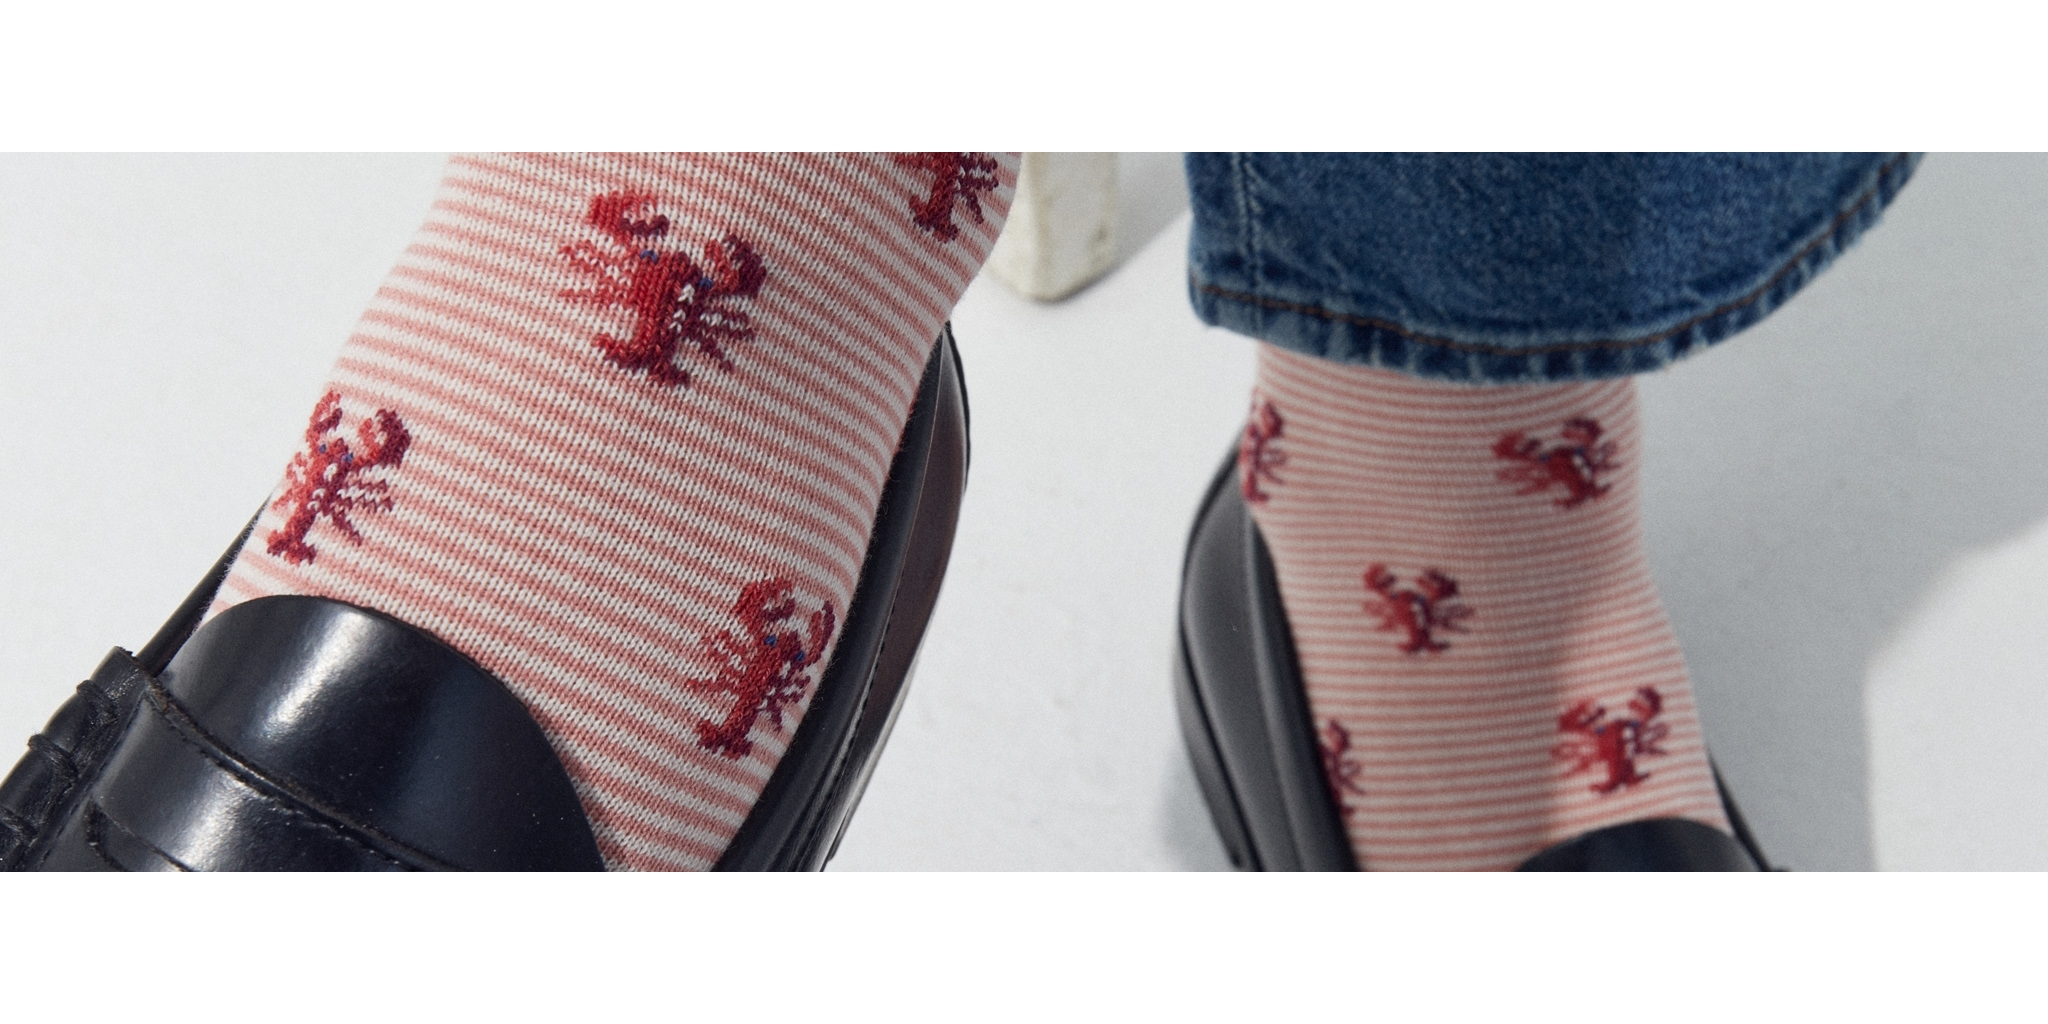 Men' socks